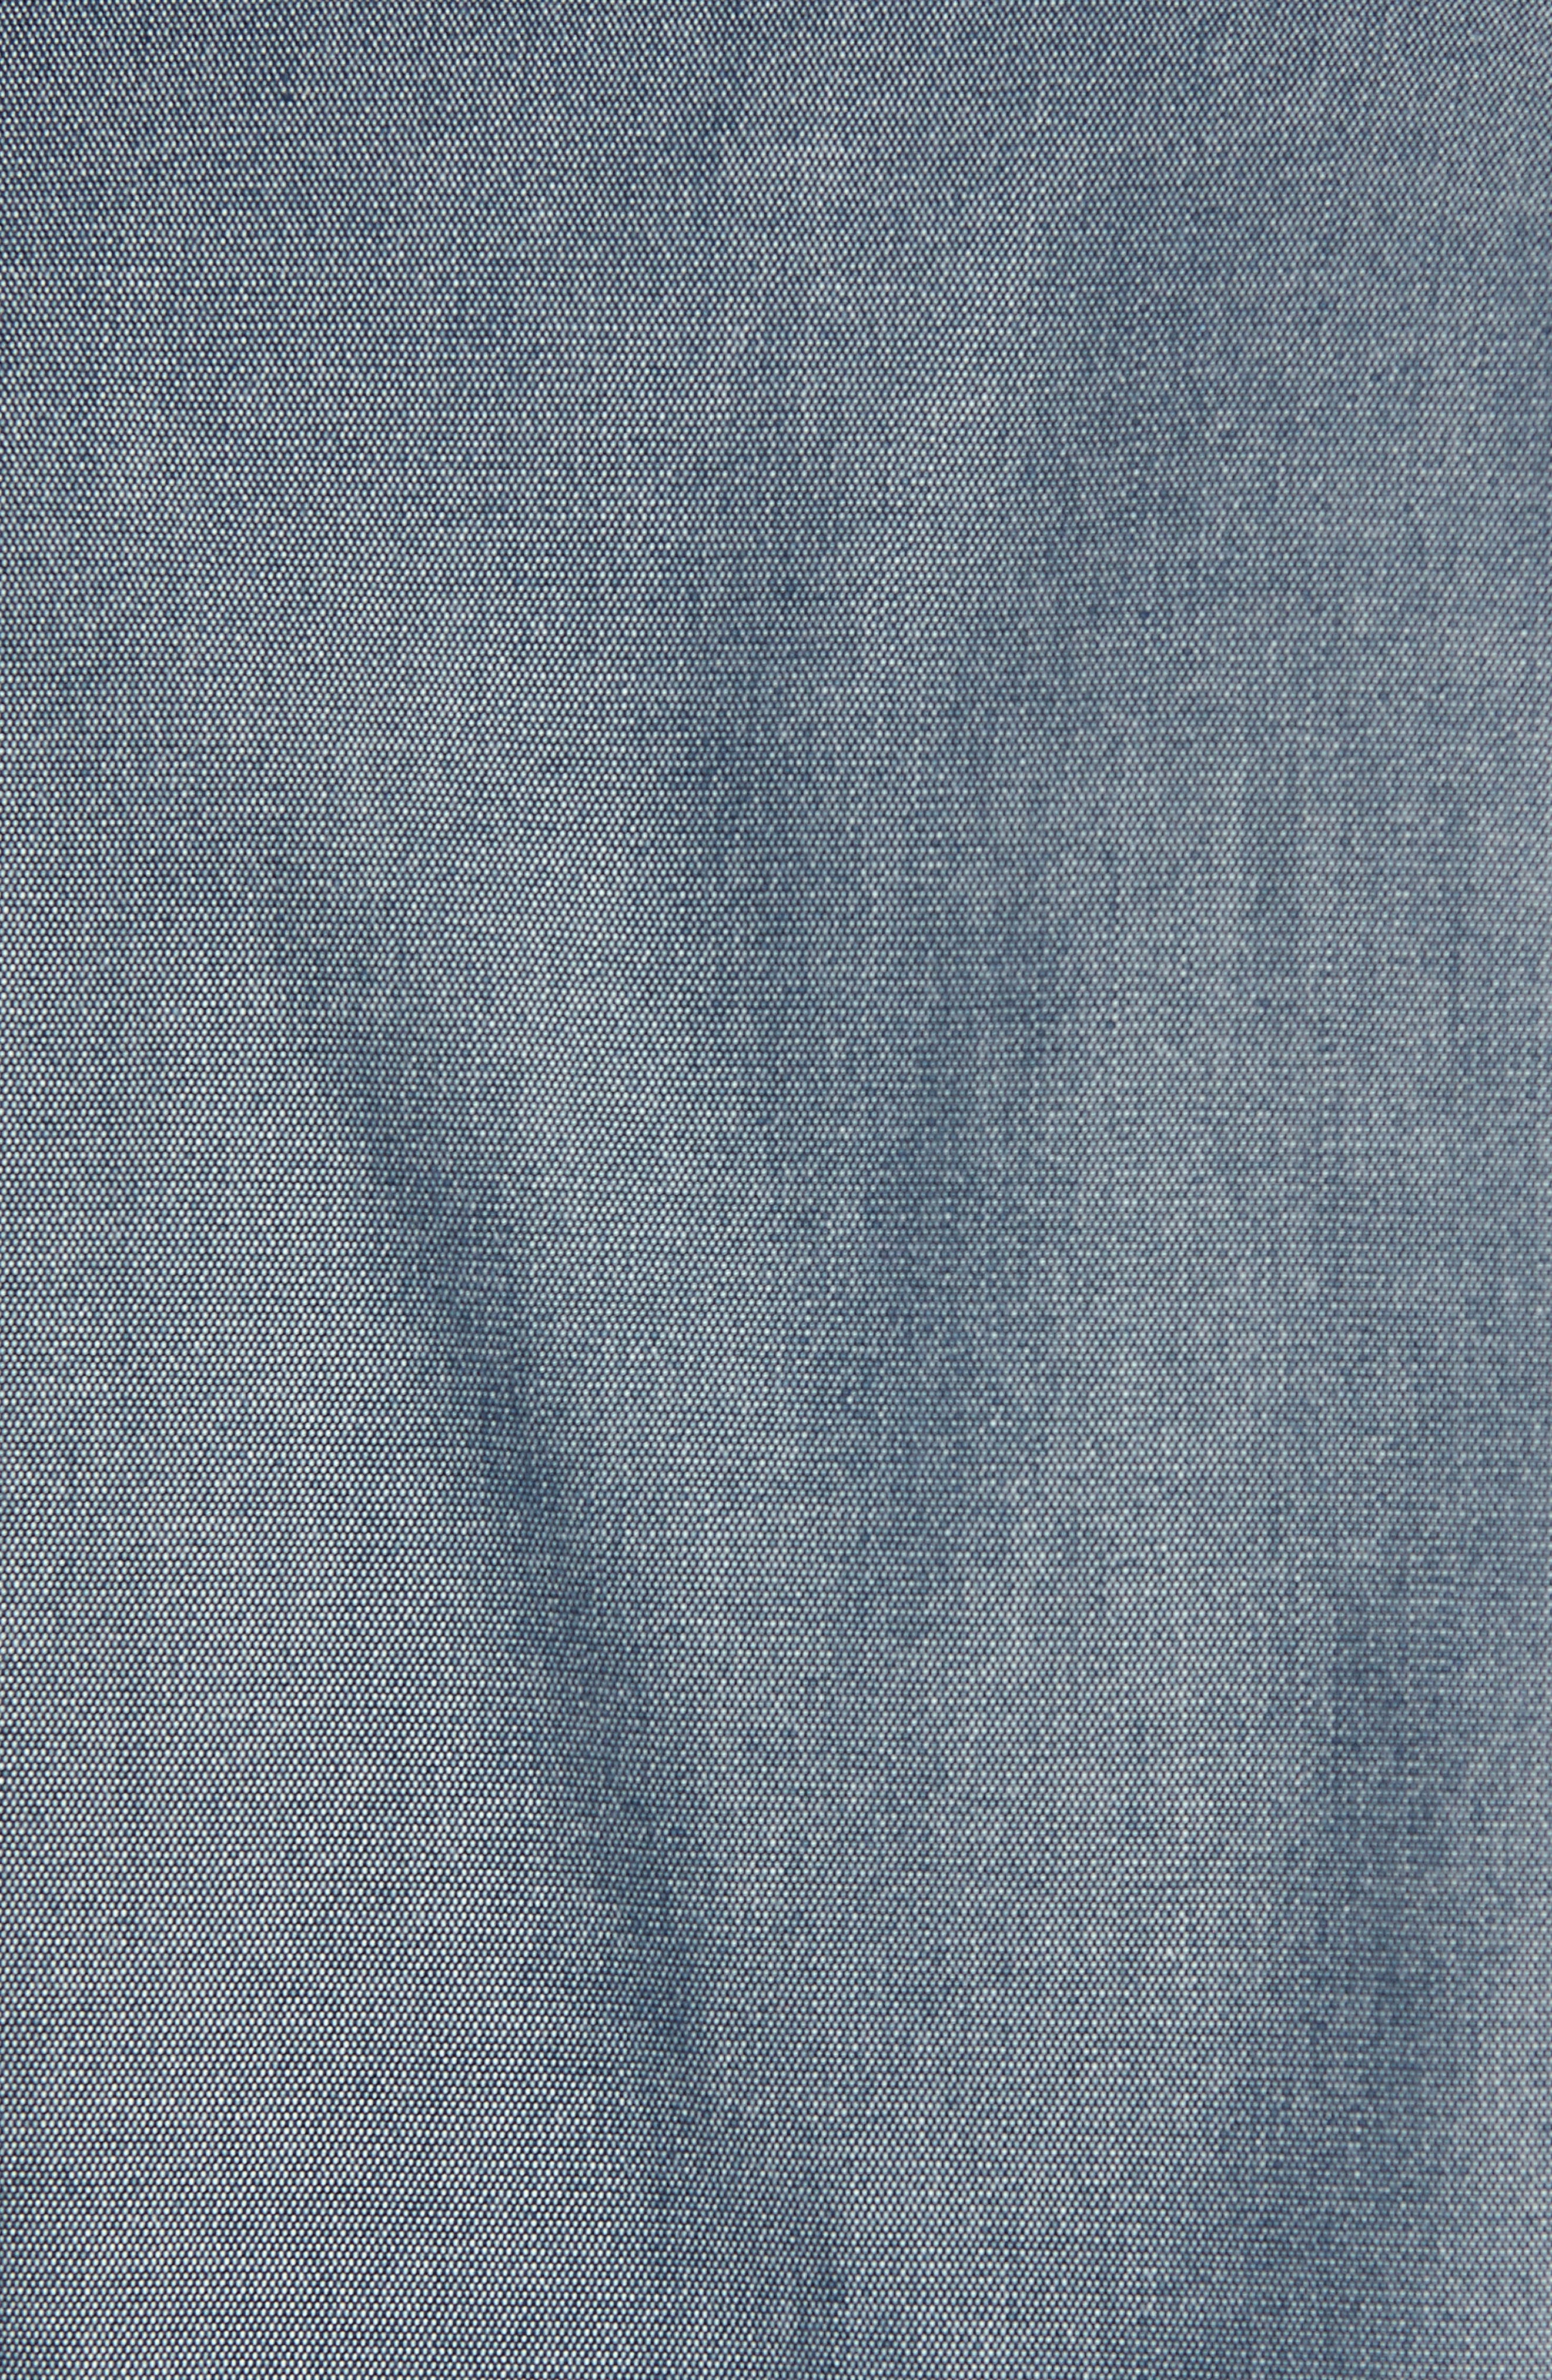 Harrington Jacket,                             Alternate thumbnail 5, color,                             Blue Vintage Chambray